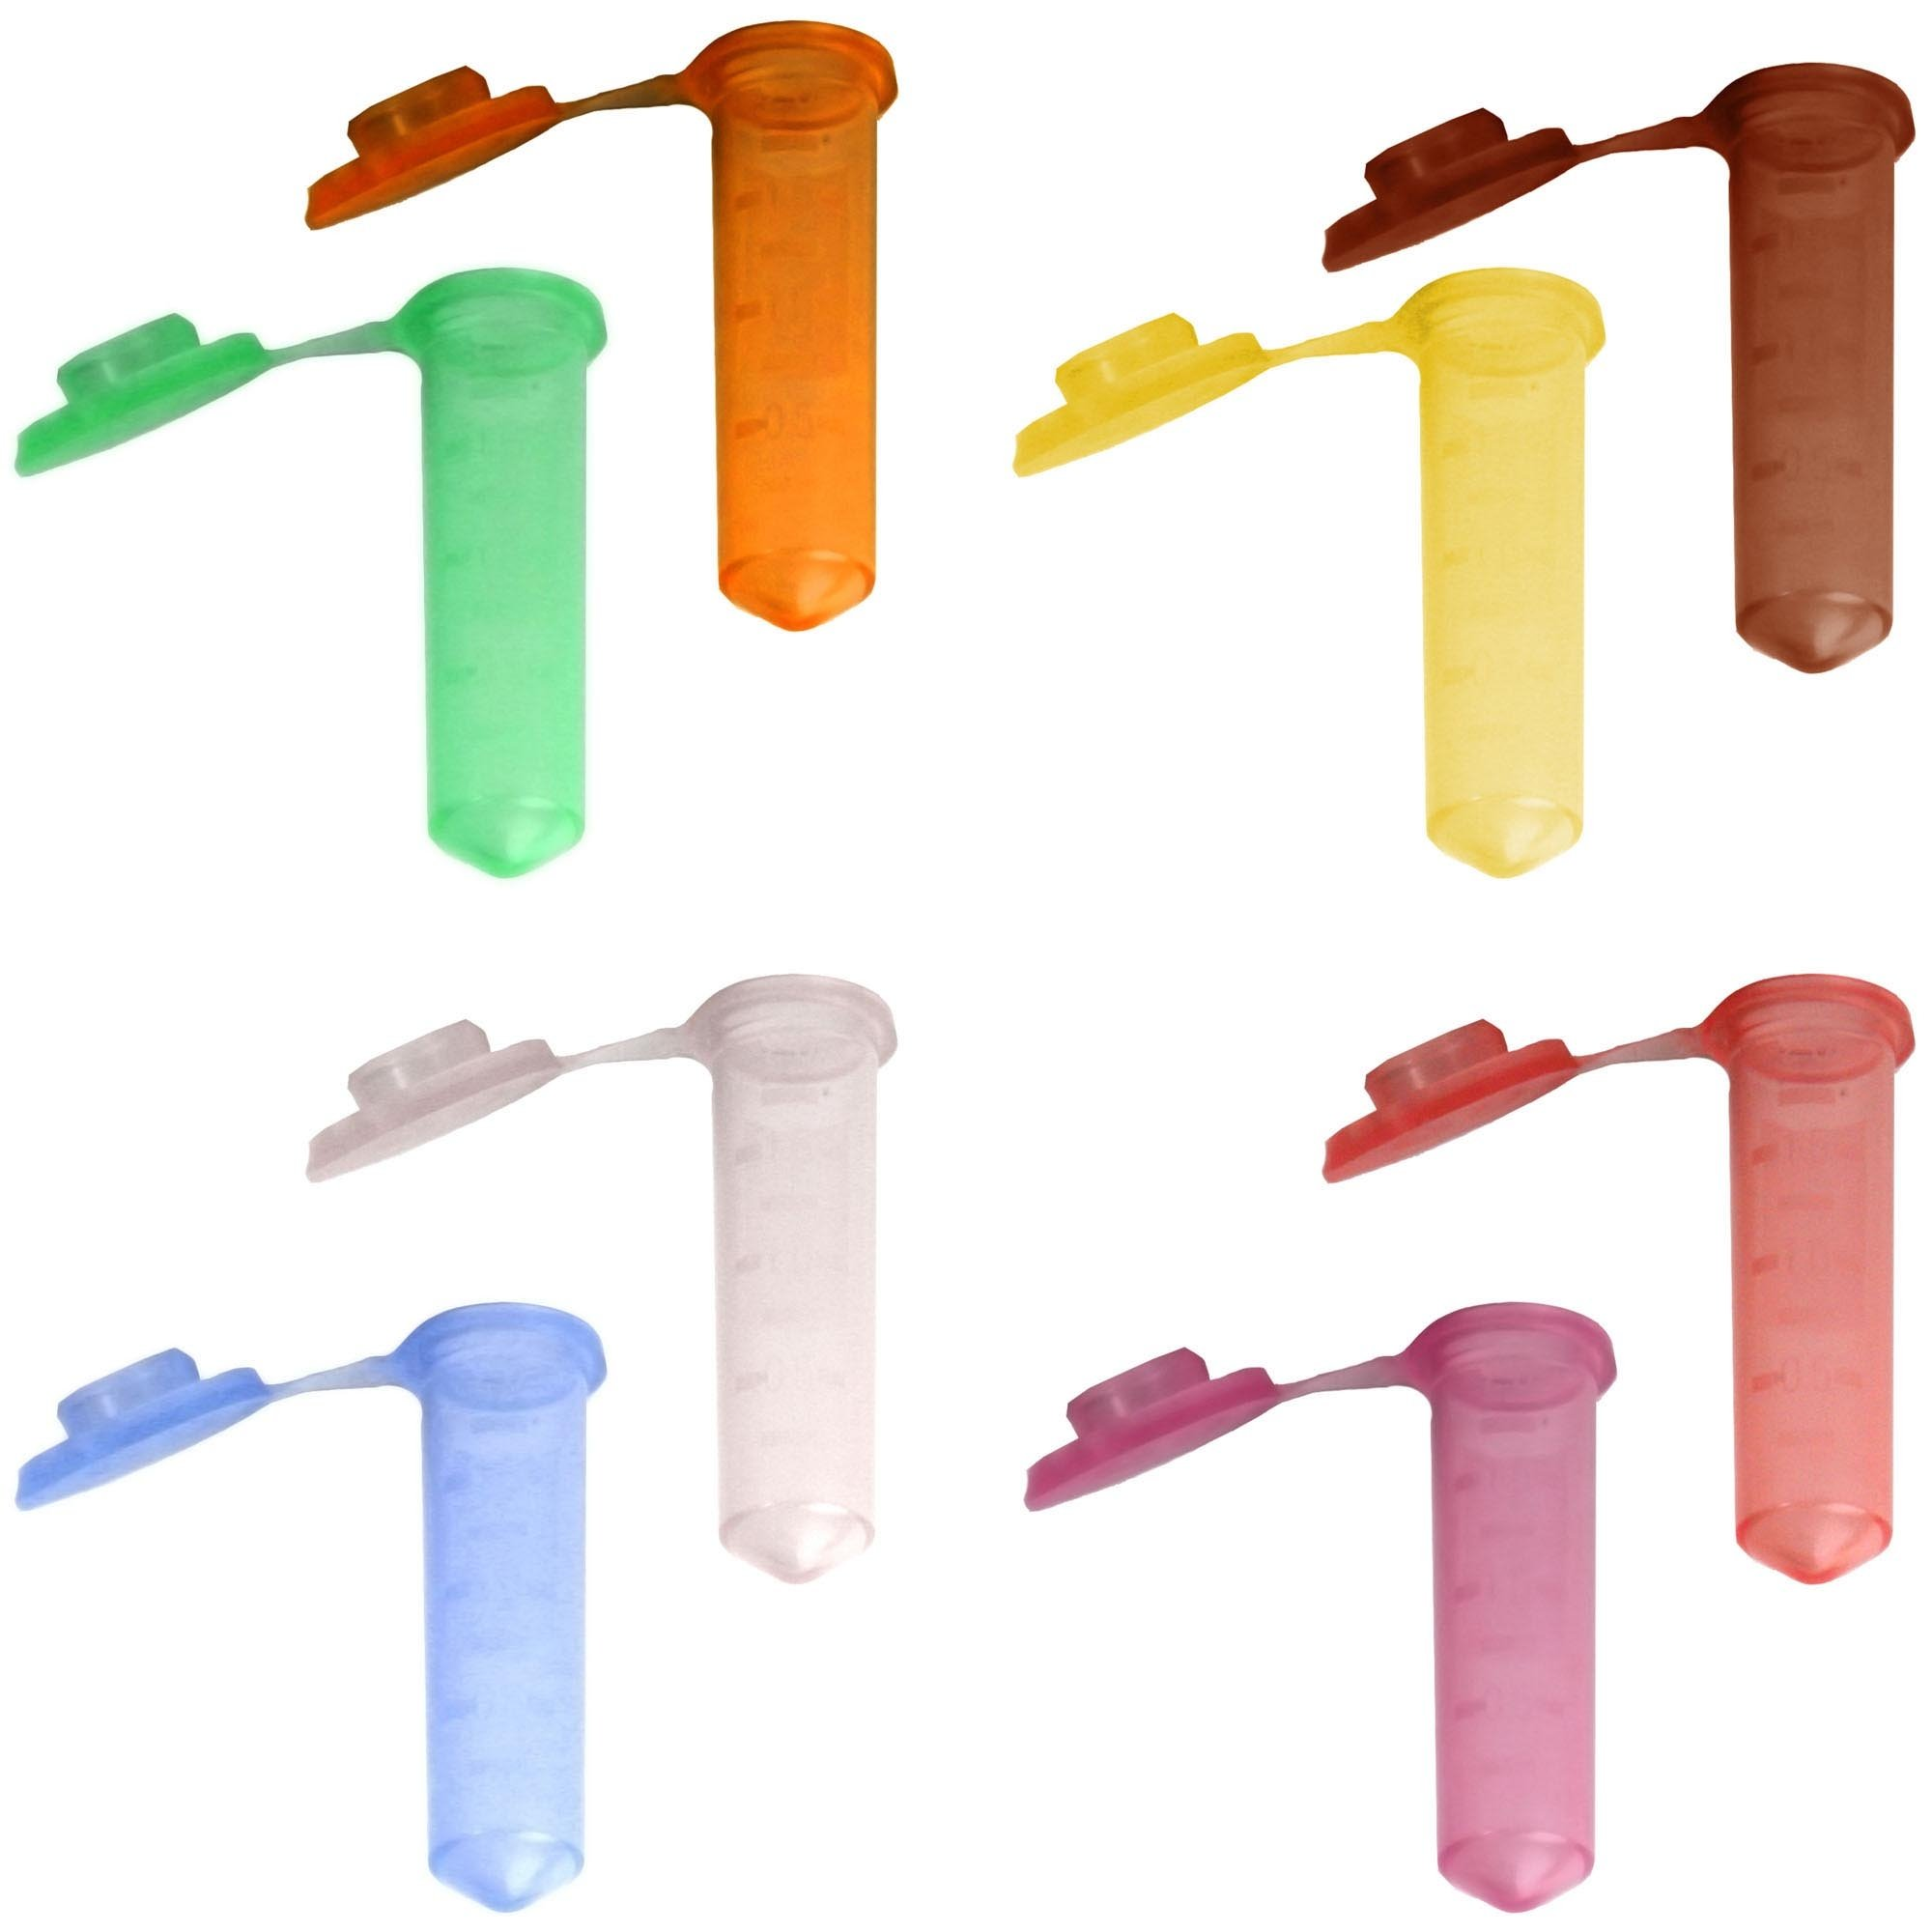 2.0mL G-Tube Flat Top Microcentrifuge Tube - Rainbow